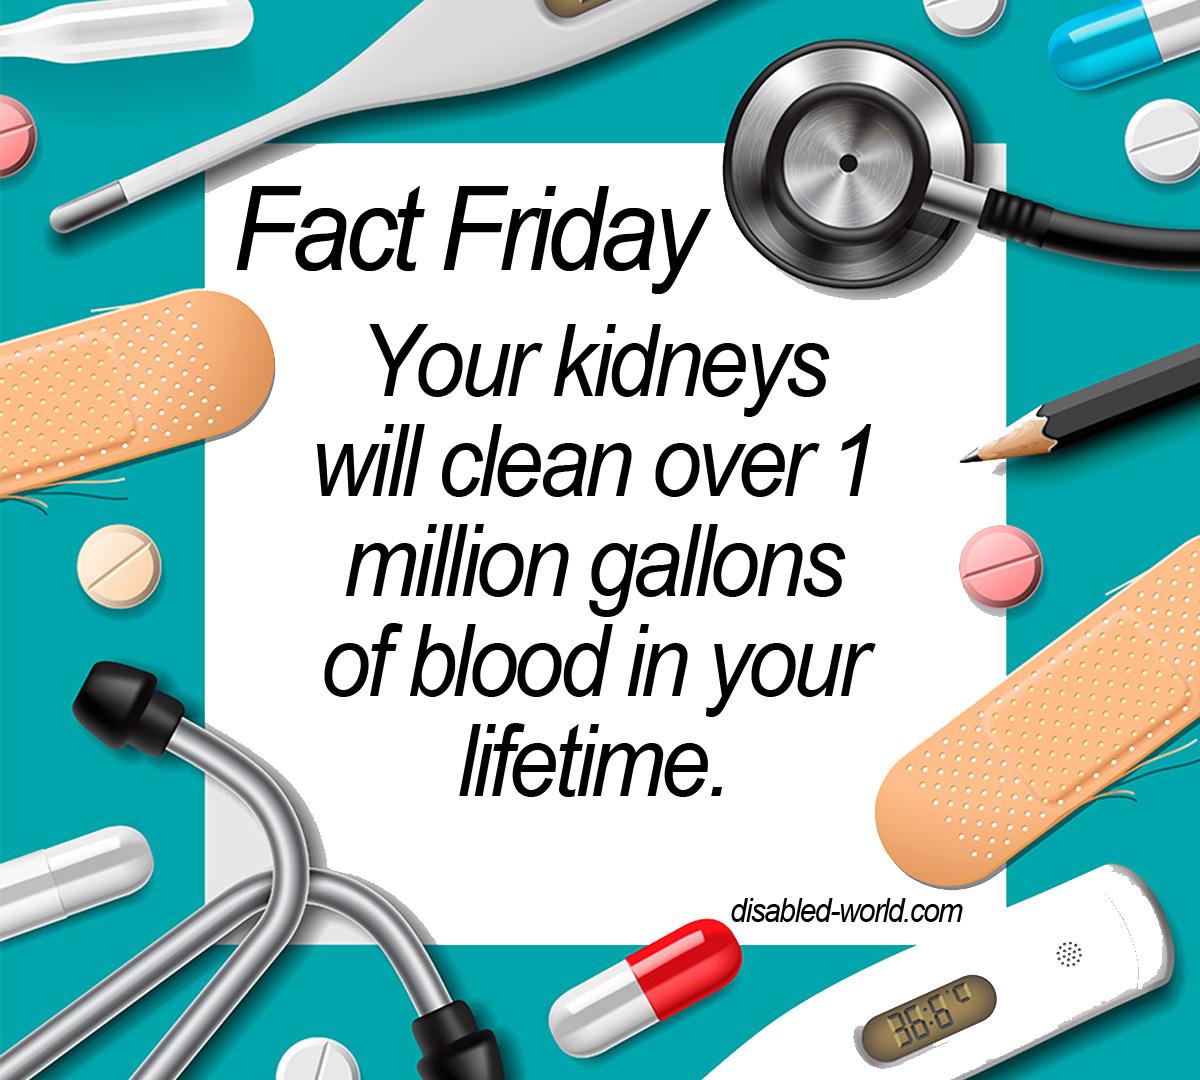 Fact Friday - June 17